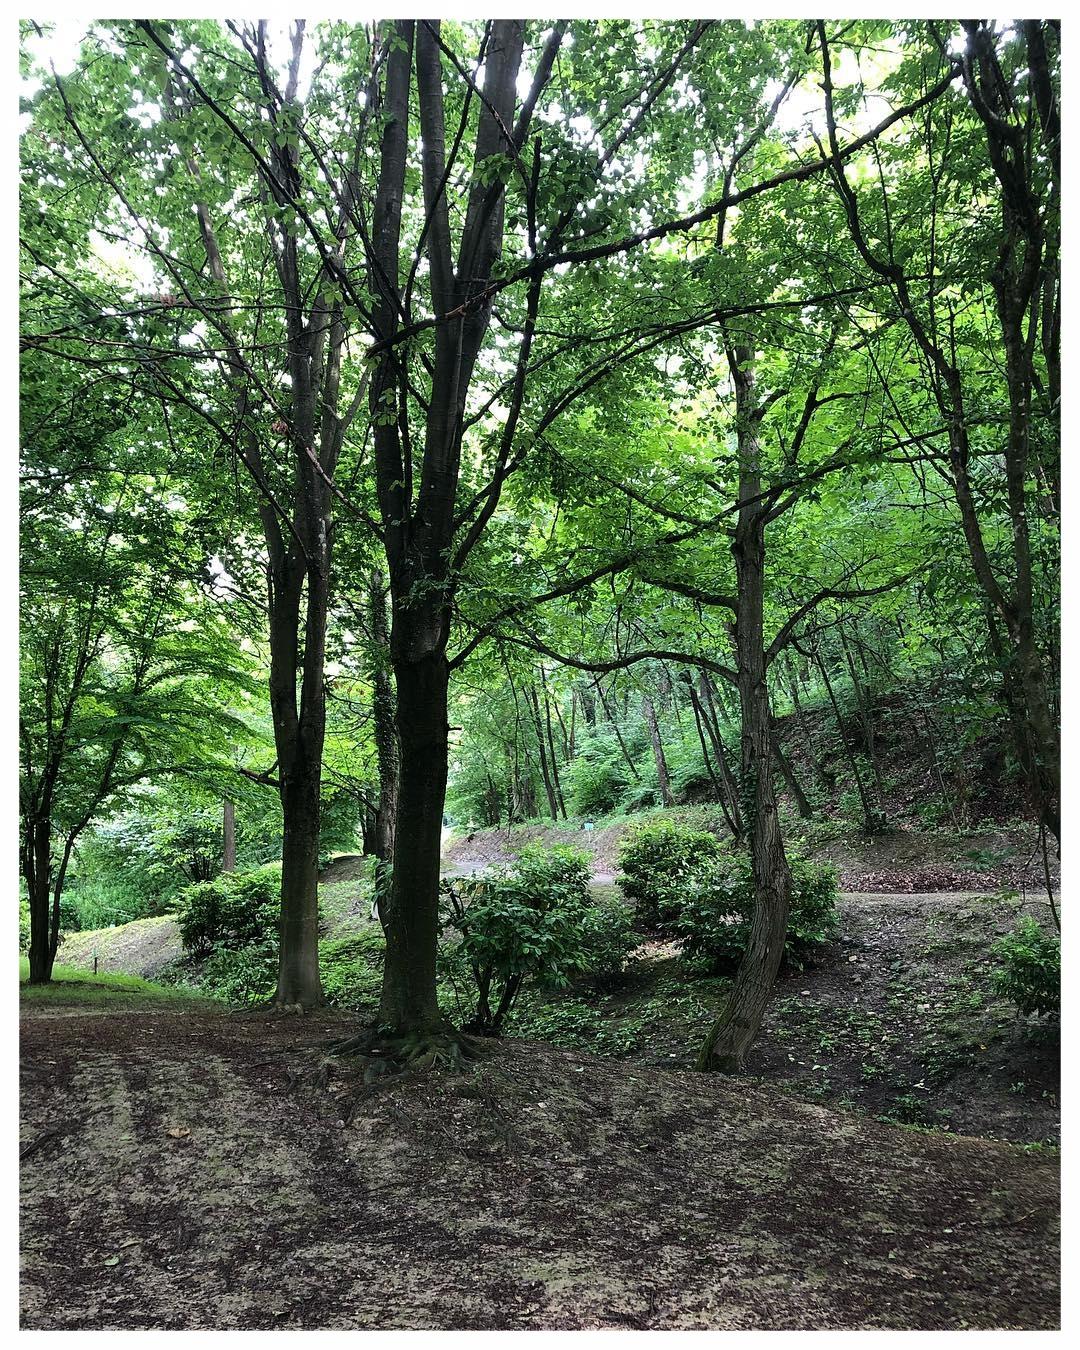 sentieri percorsi itinerari langhe e roero langa romantica bosco dei pensieri serralunga alba aforismi.jpg